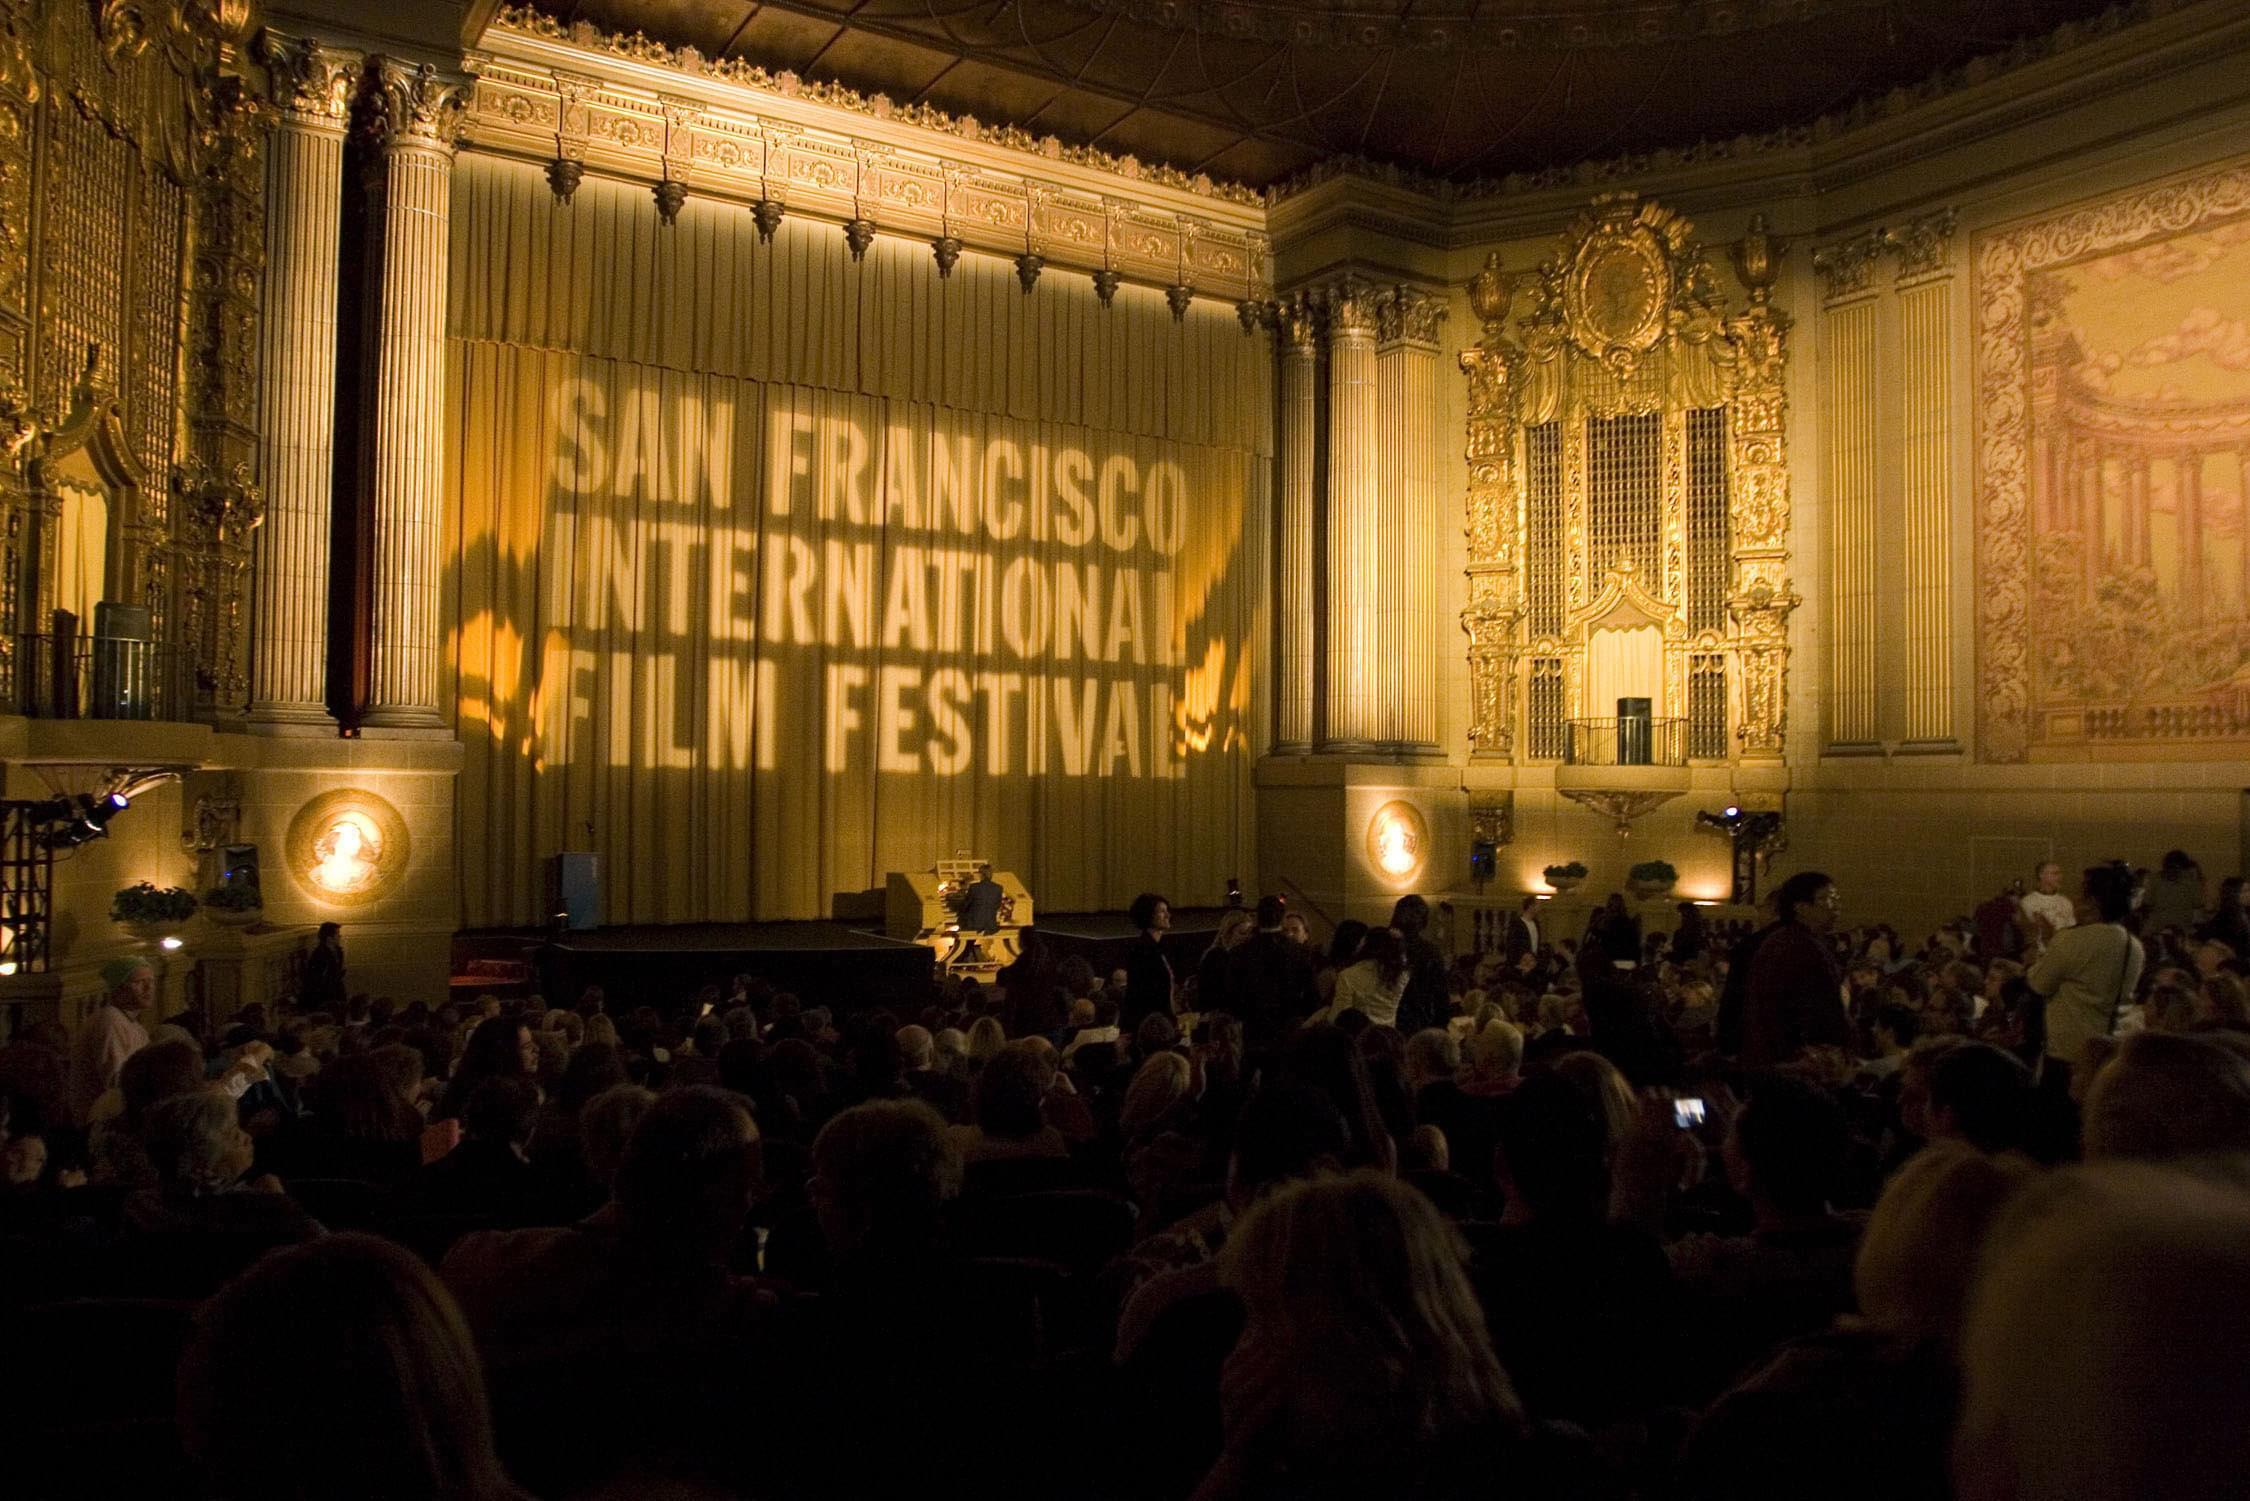 Bay Area film festival season kicks off with San Francisco International Film Festival